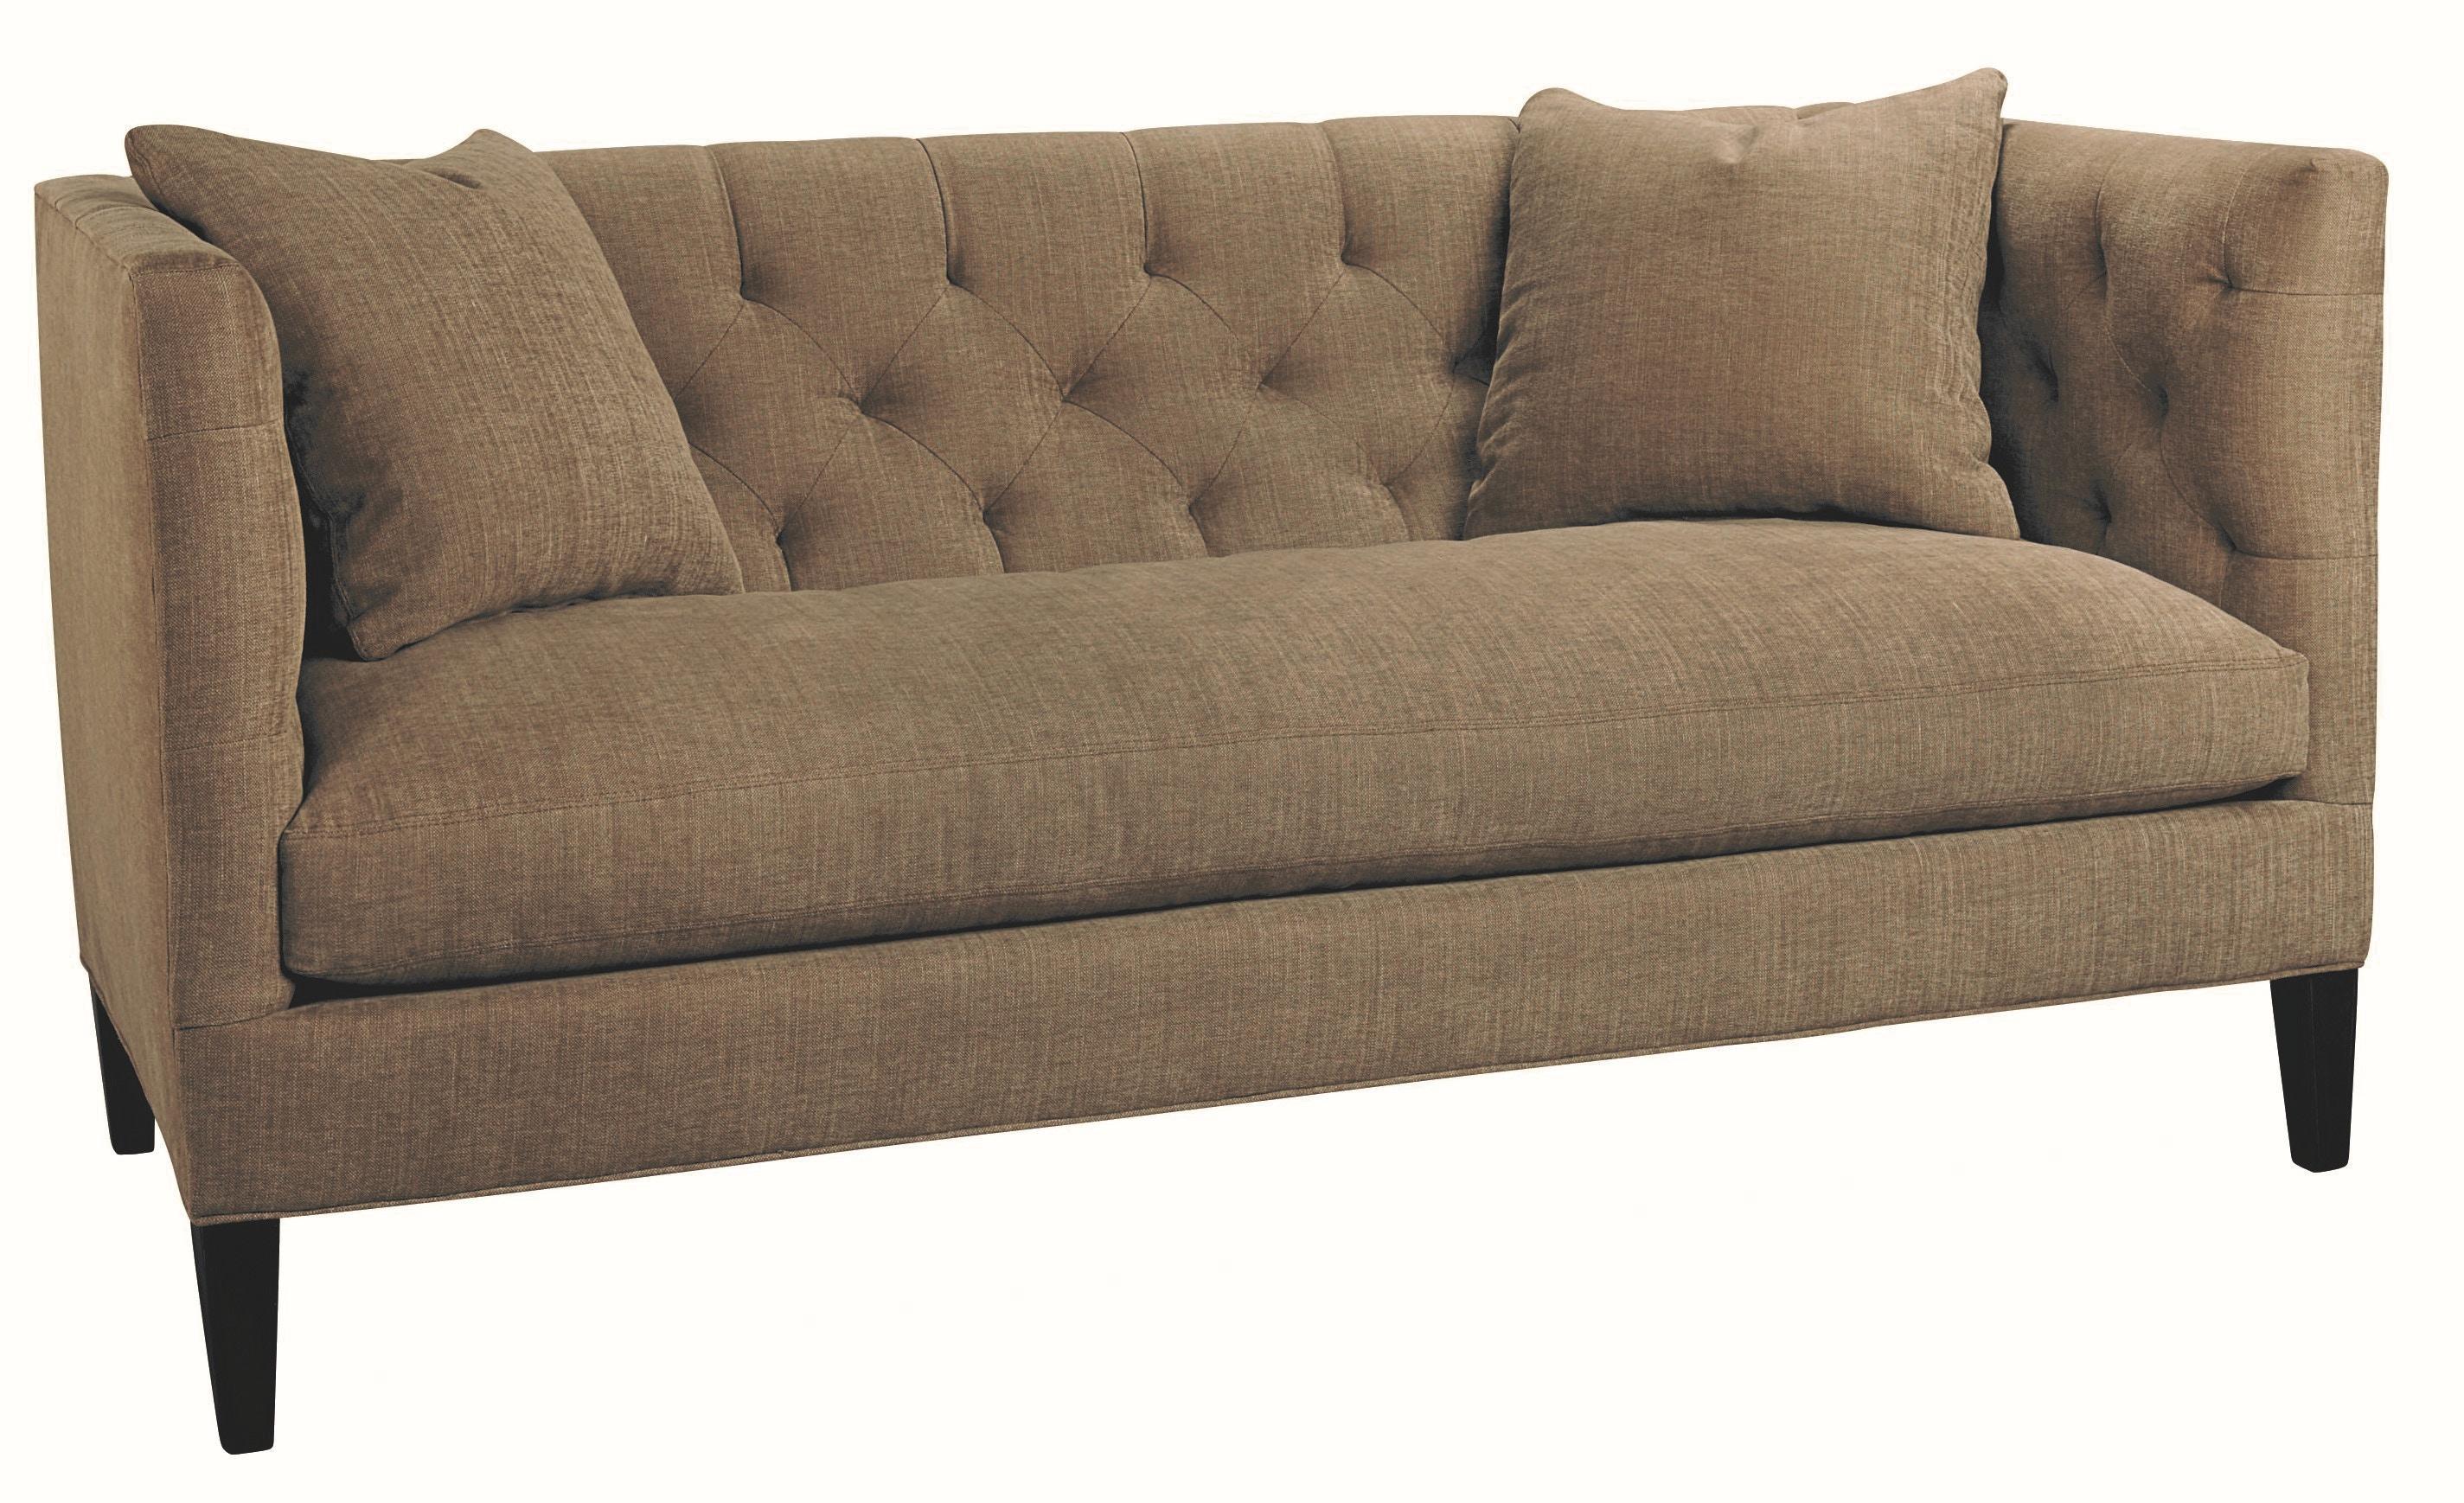 lee industries leather sofa kivik cover uk living room apartment l7733 11